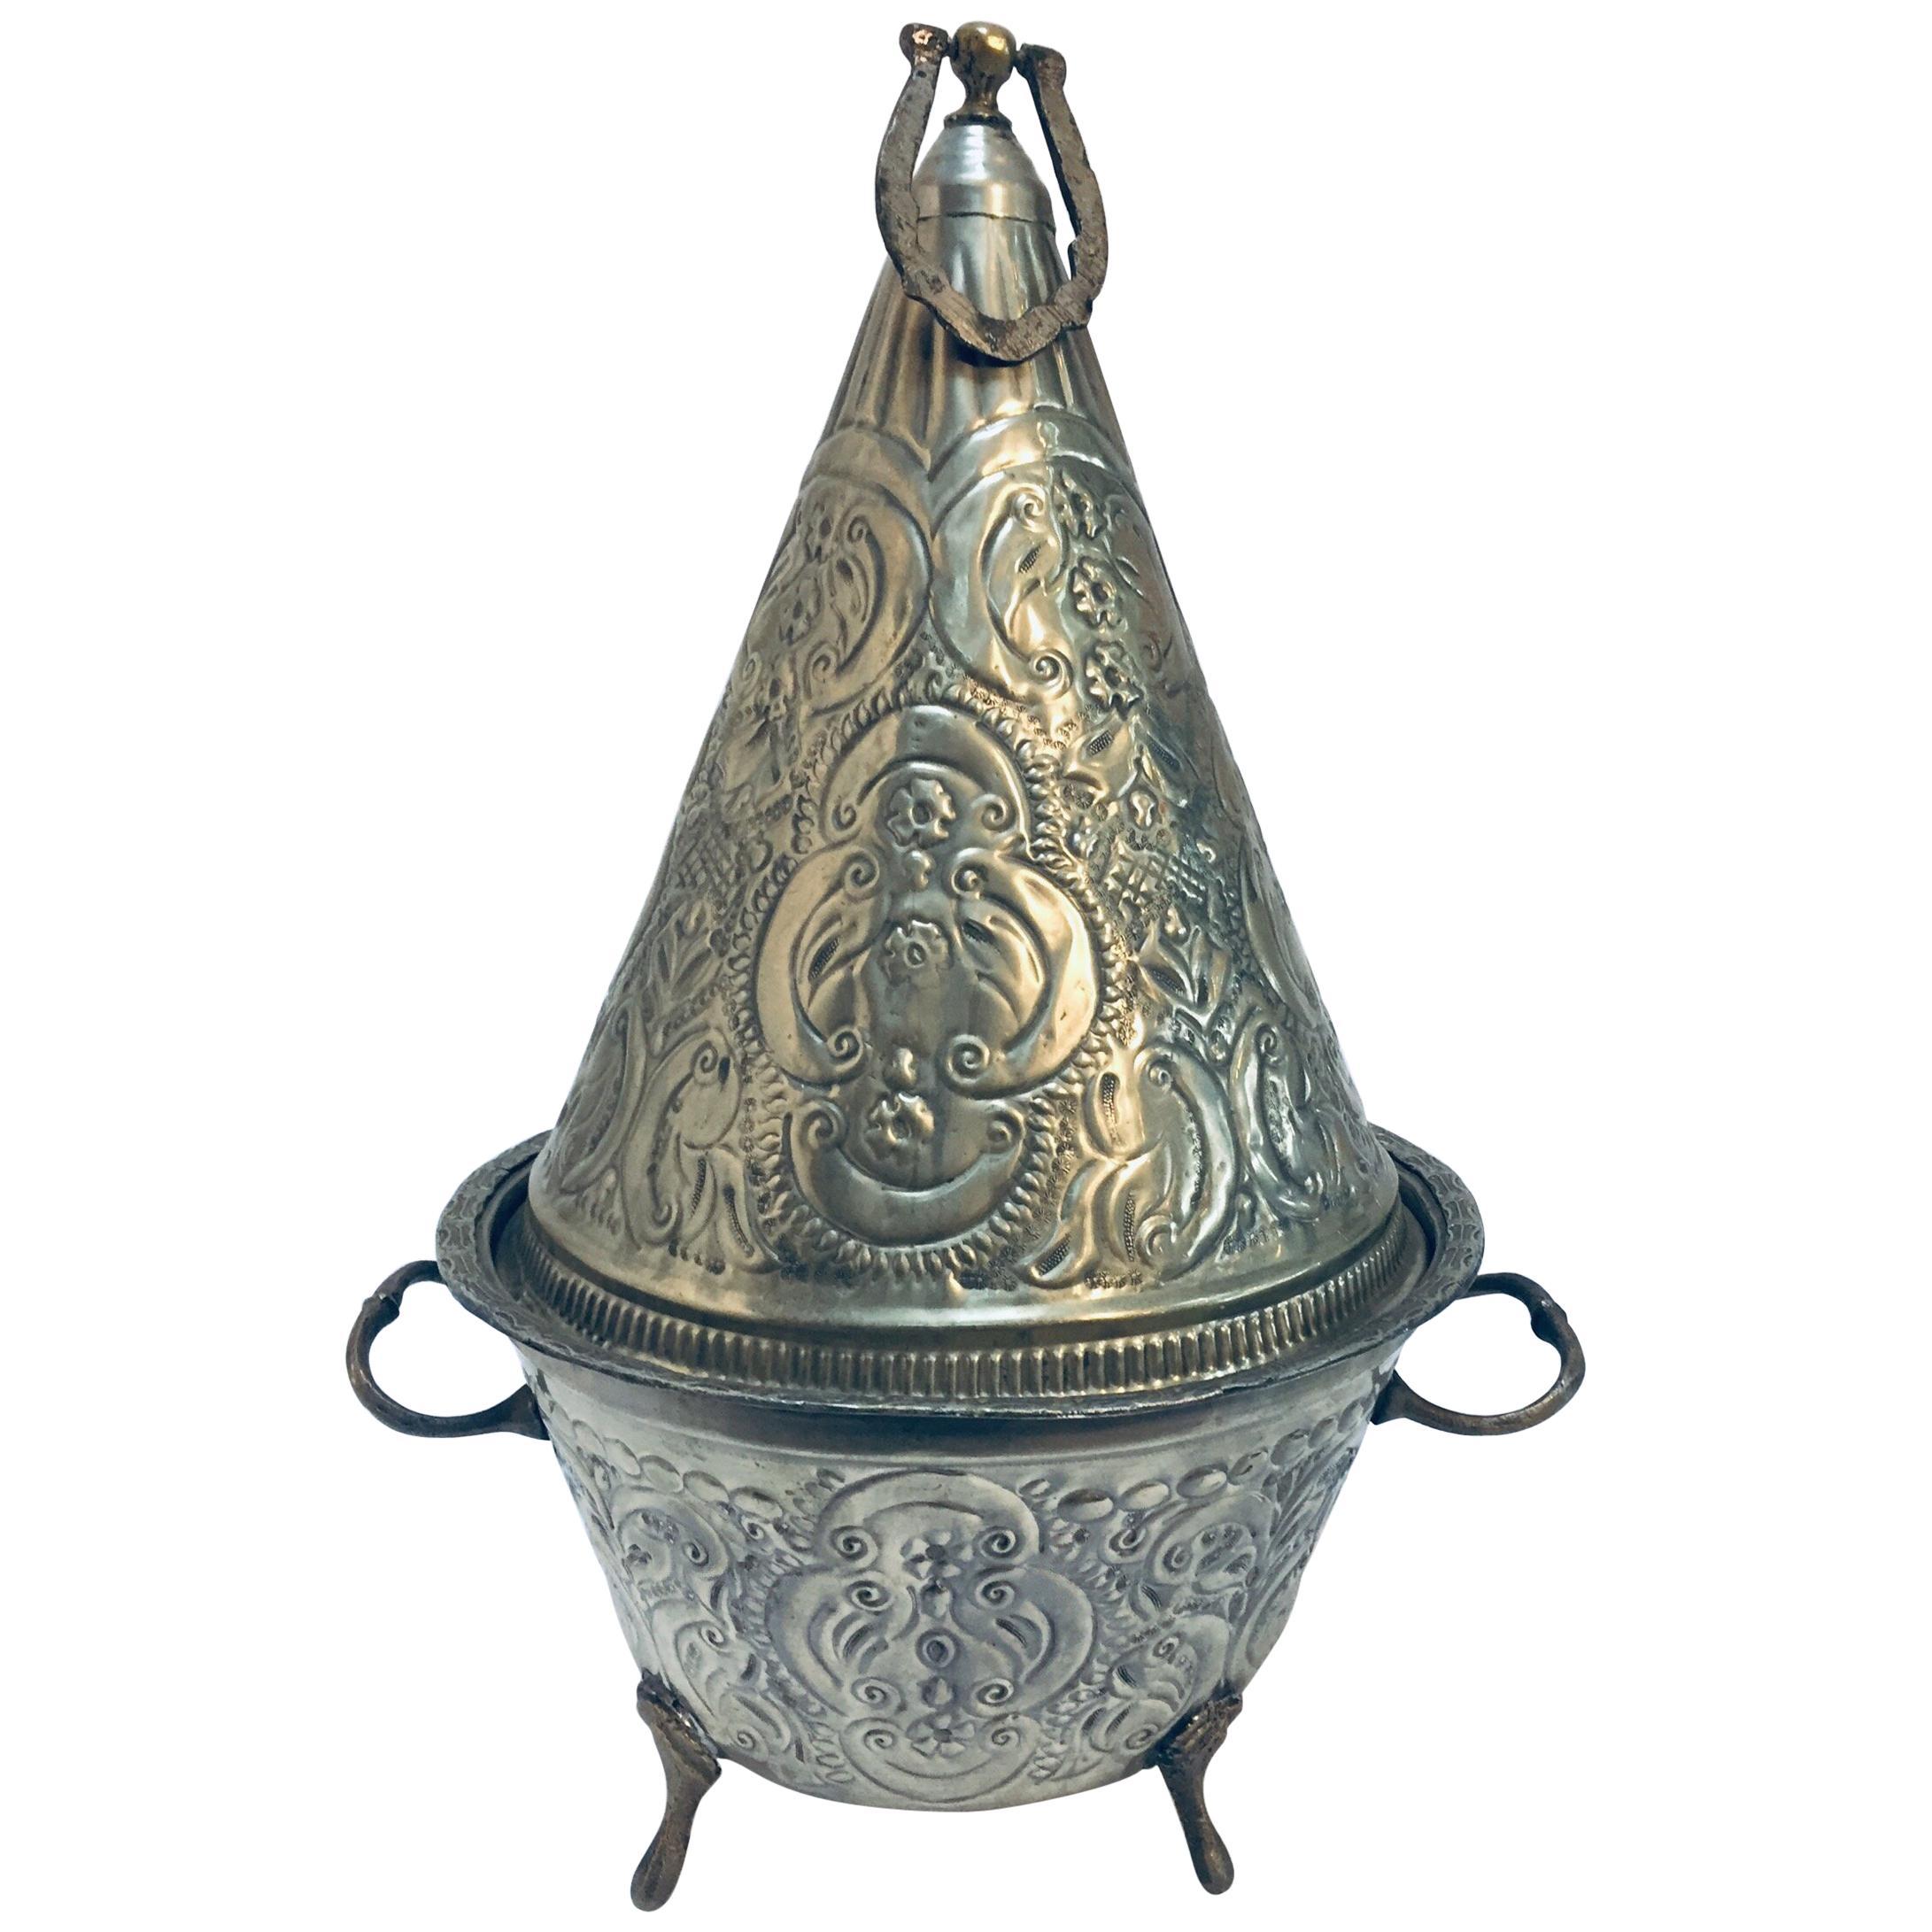 Moorish Silver Repousse Serving Dish Tajine with Cover